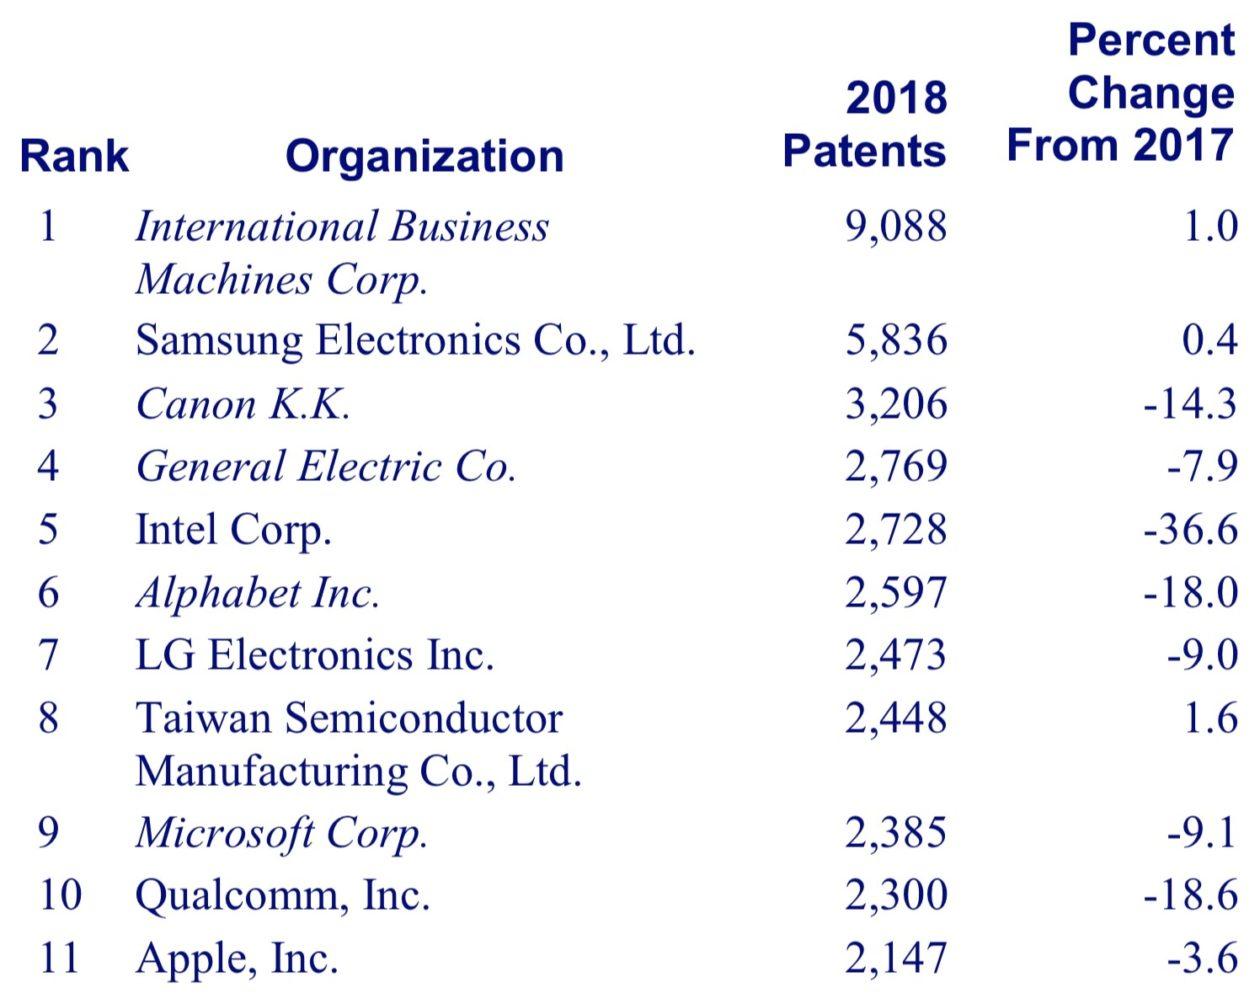 Patent Ranking